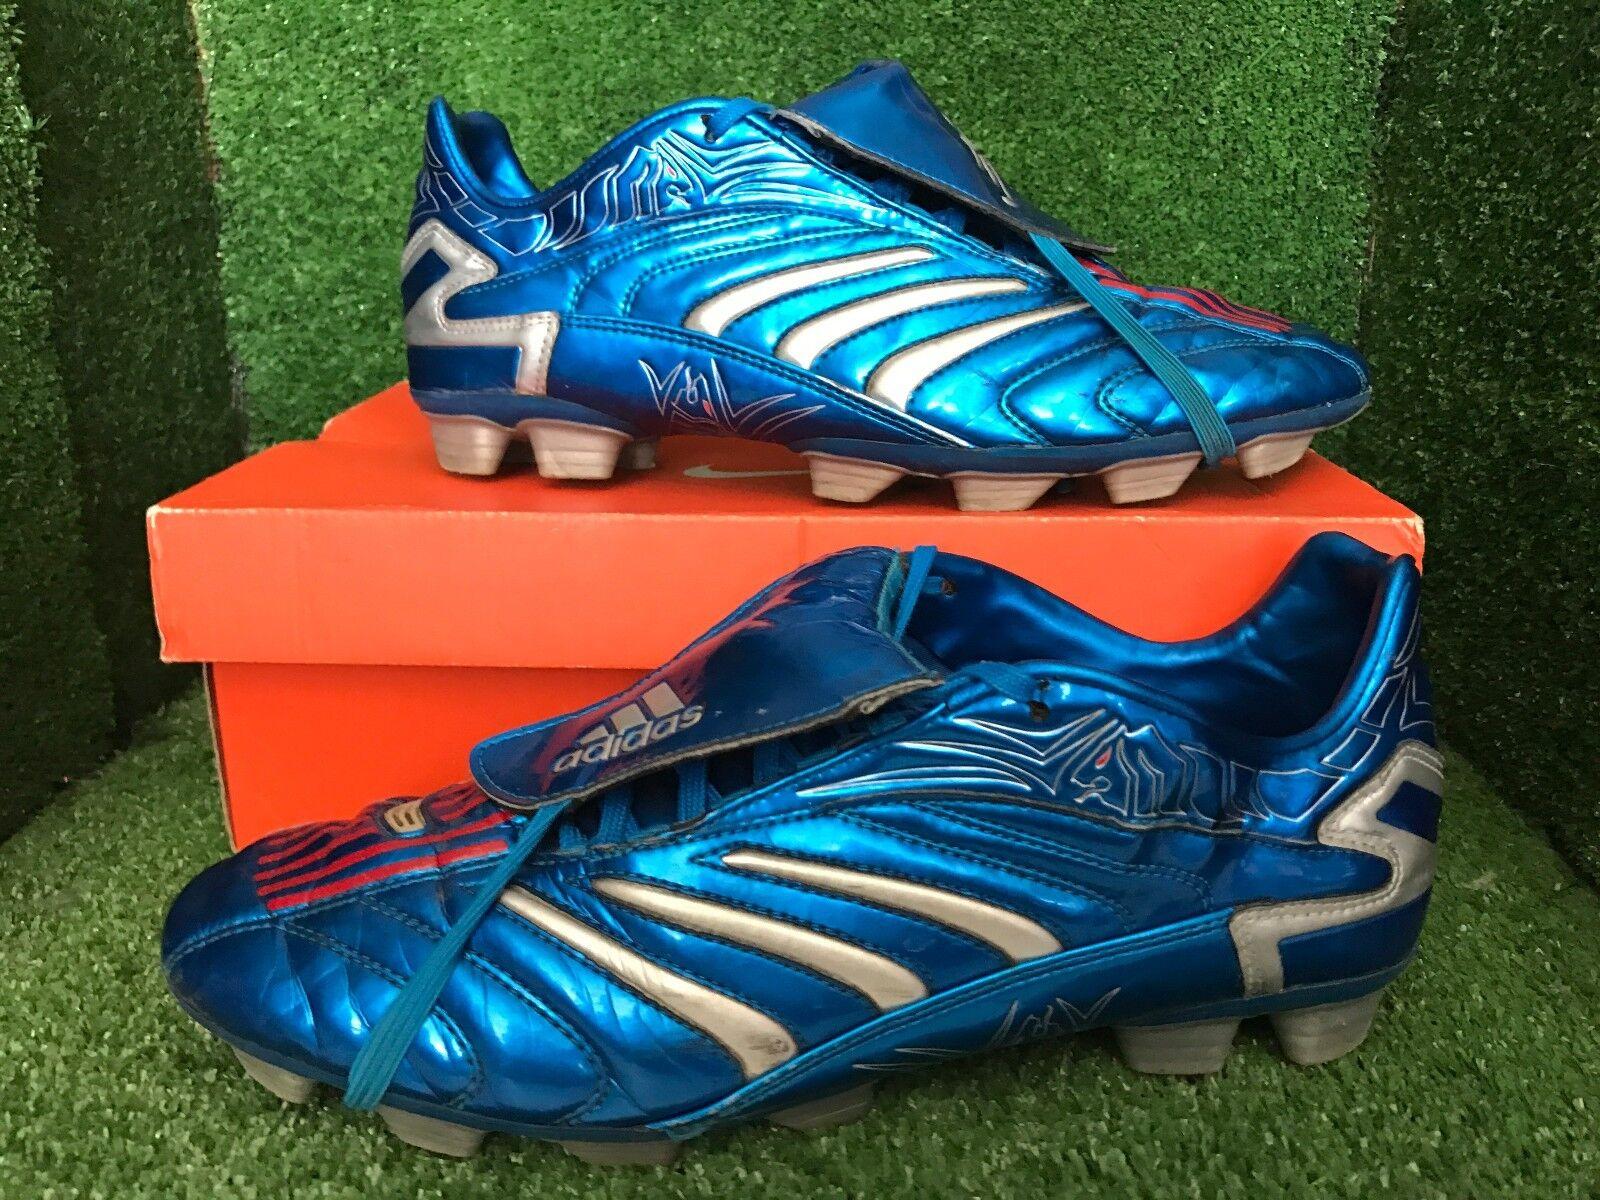 Adidas ProjoATOR PULSO Powerswerve absoluta Traxion zapatos talla 11,5 10,5 45